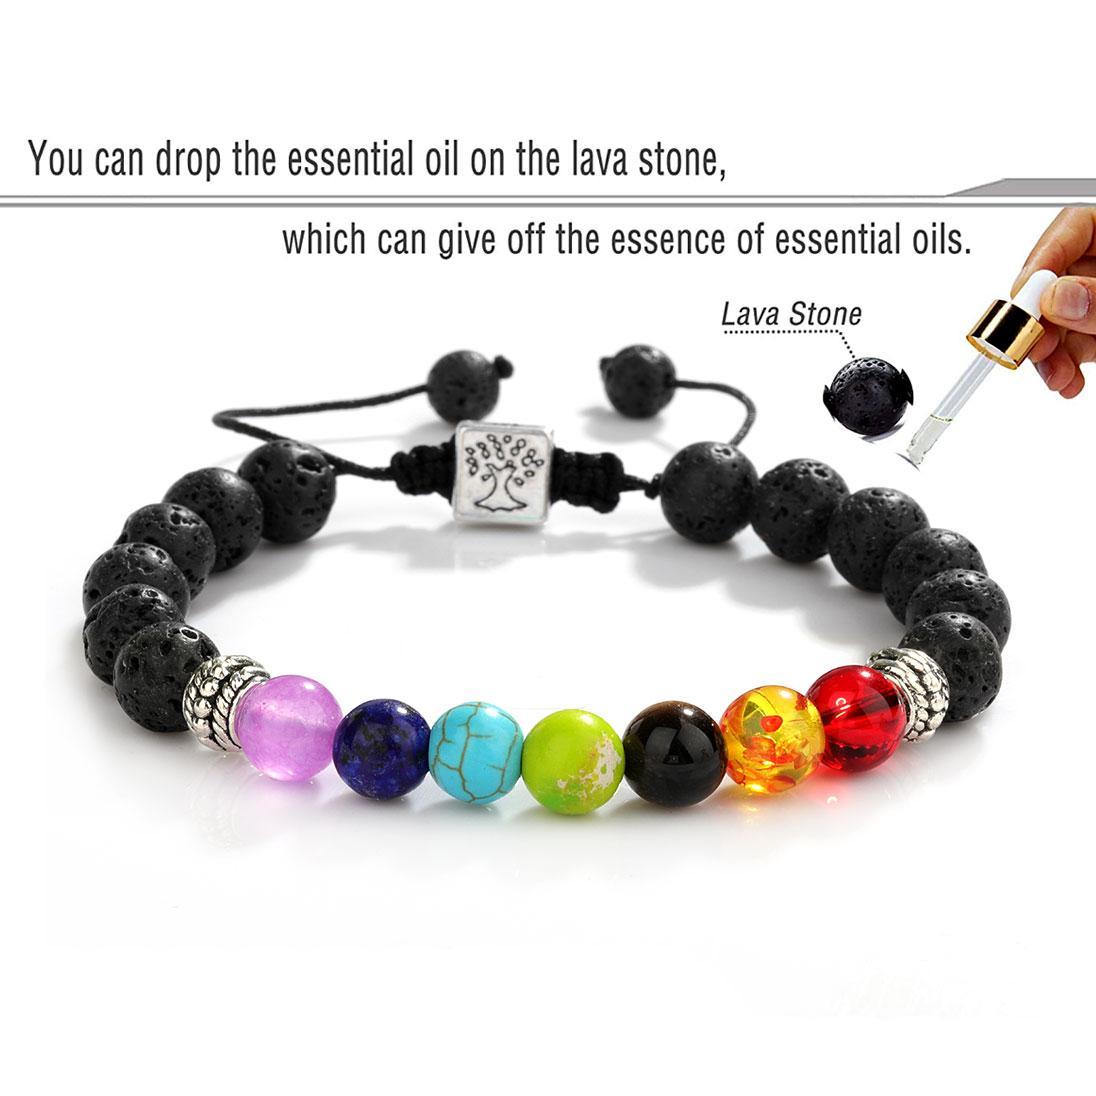 7 Chakra Natural Stone Bracelet Tree of Life Charm Yoga Healing Balancing Oil Diffuser Bead Braided Bracelets